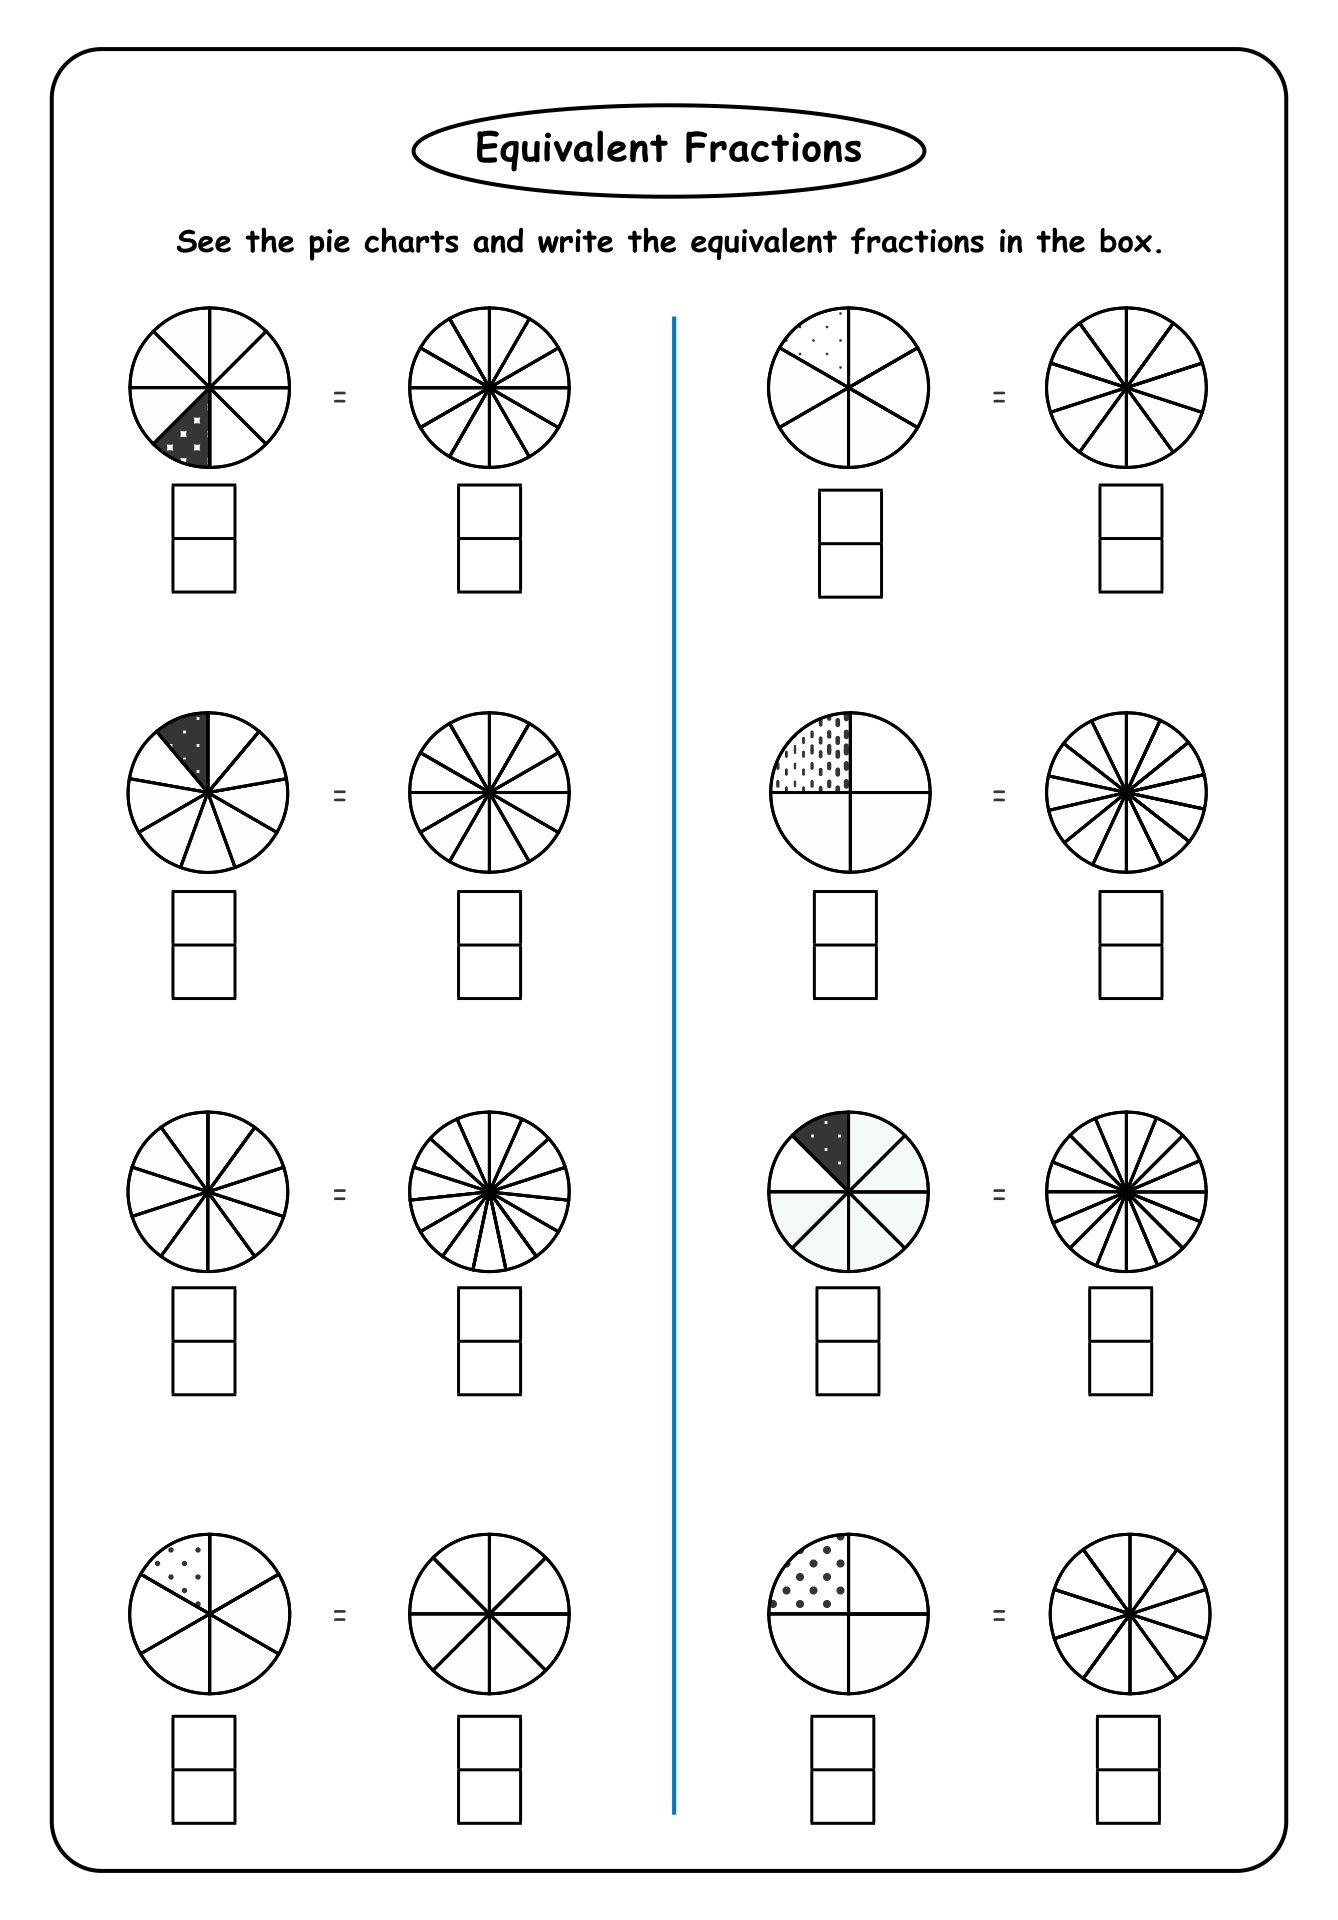 Equivalent Fractions Pie Chart Worksheet